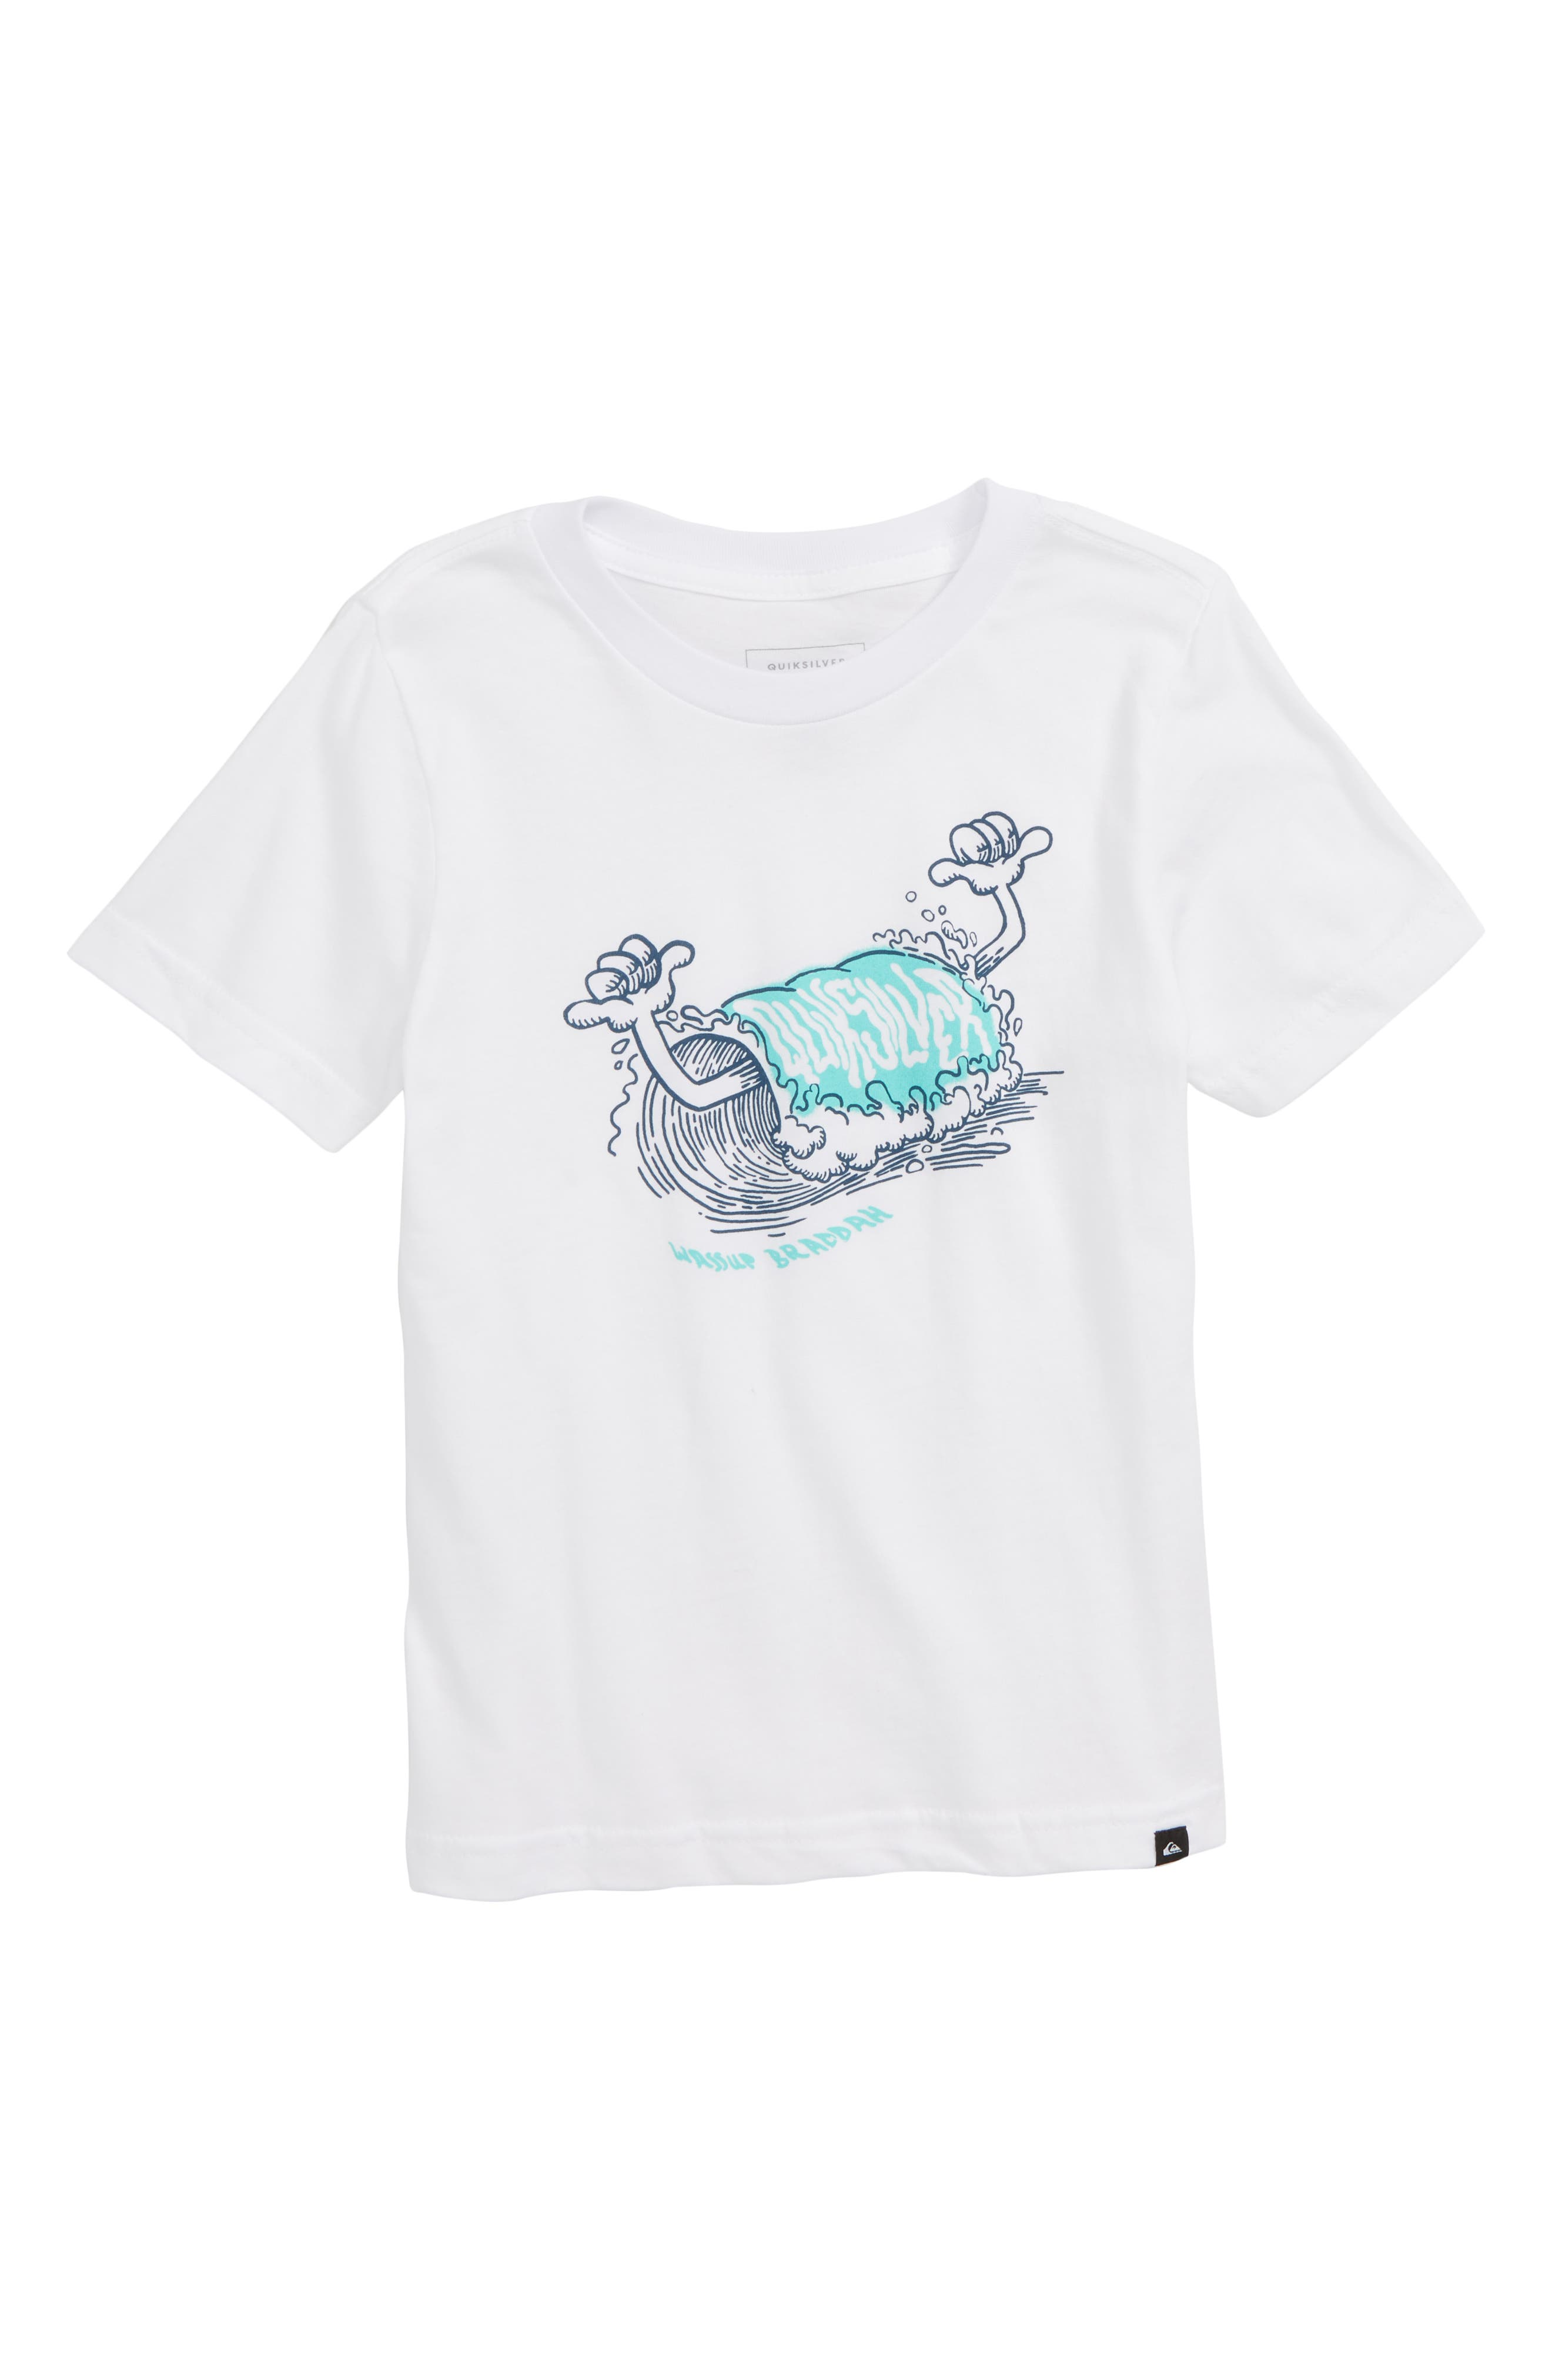 Wassup Braddah T-Shirt,                             Main thumbnail 1, color,                             WHITE